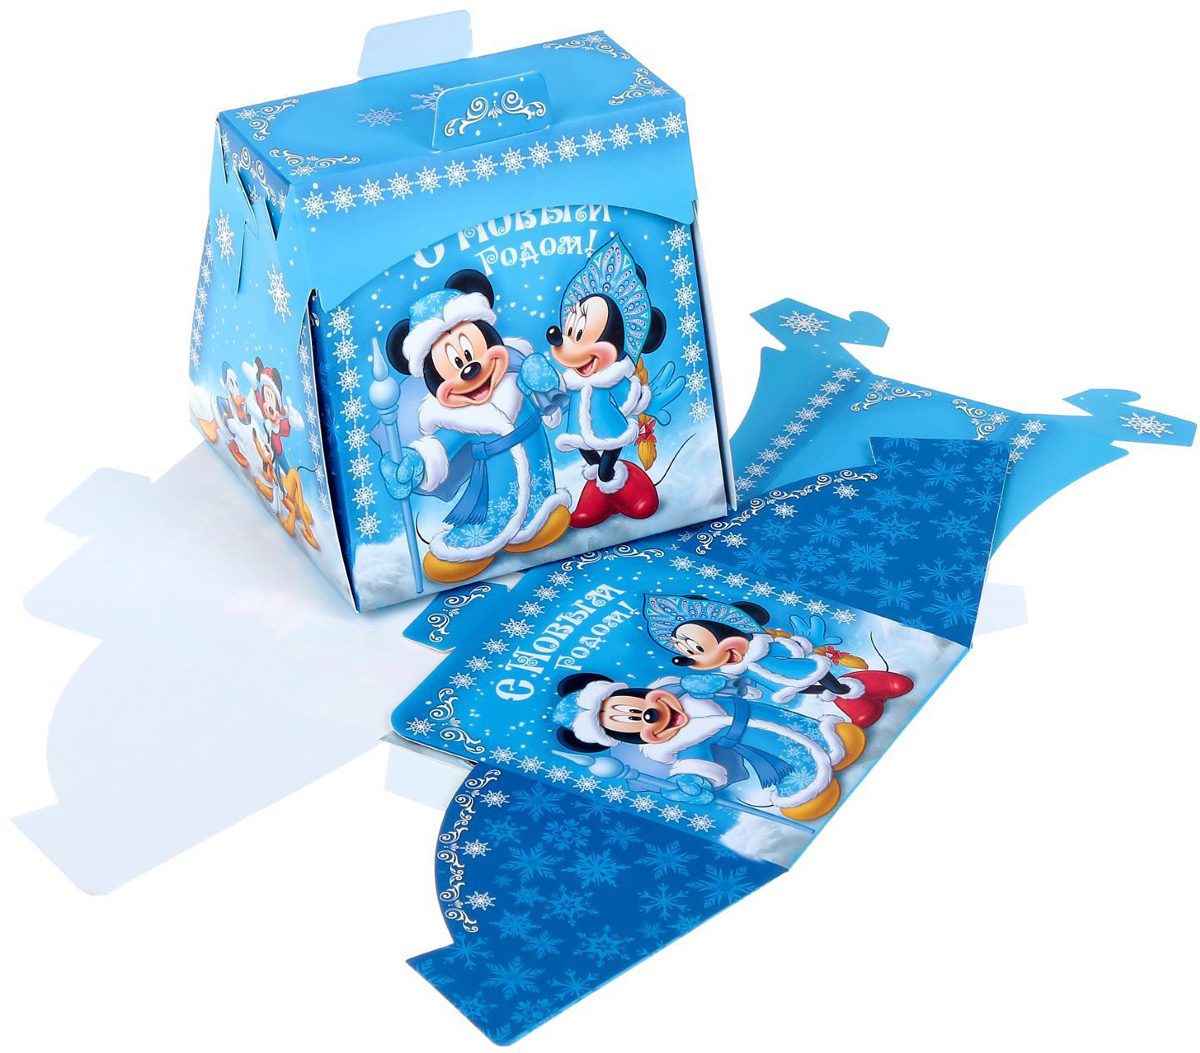 Коробка складная Disney Радости! Микки Маус и друзья, 11,5 х 11,5 х 11,5 см корзина для игрушек disney микки маус и его друзья 2732136